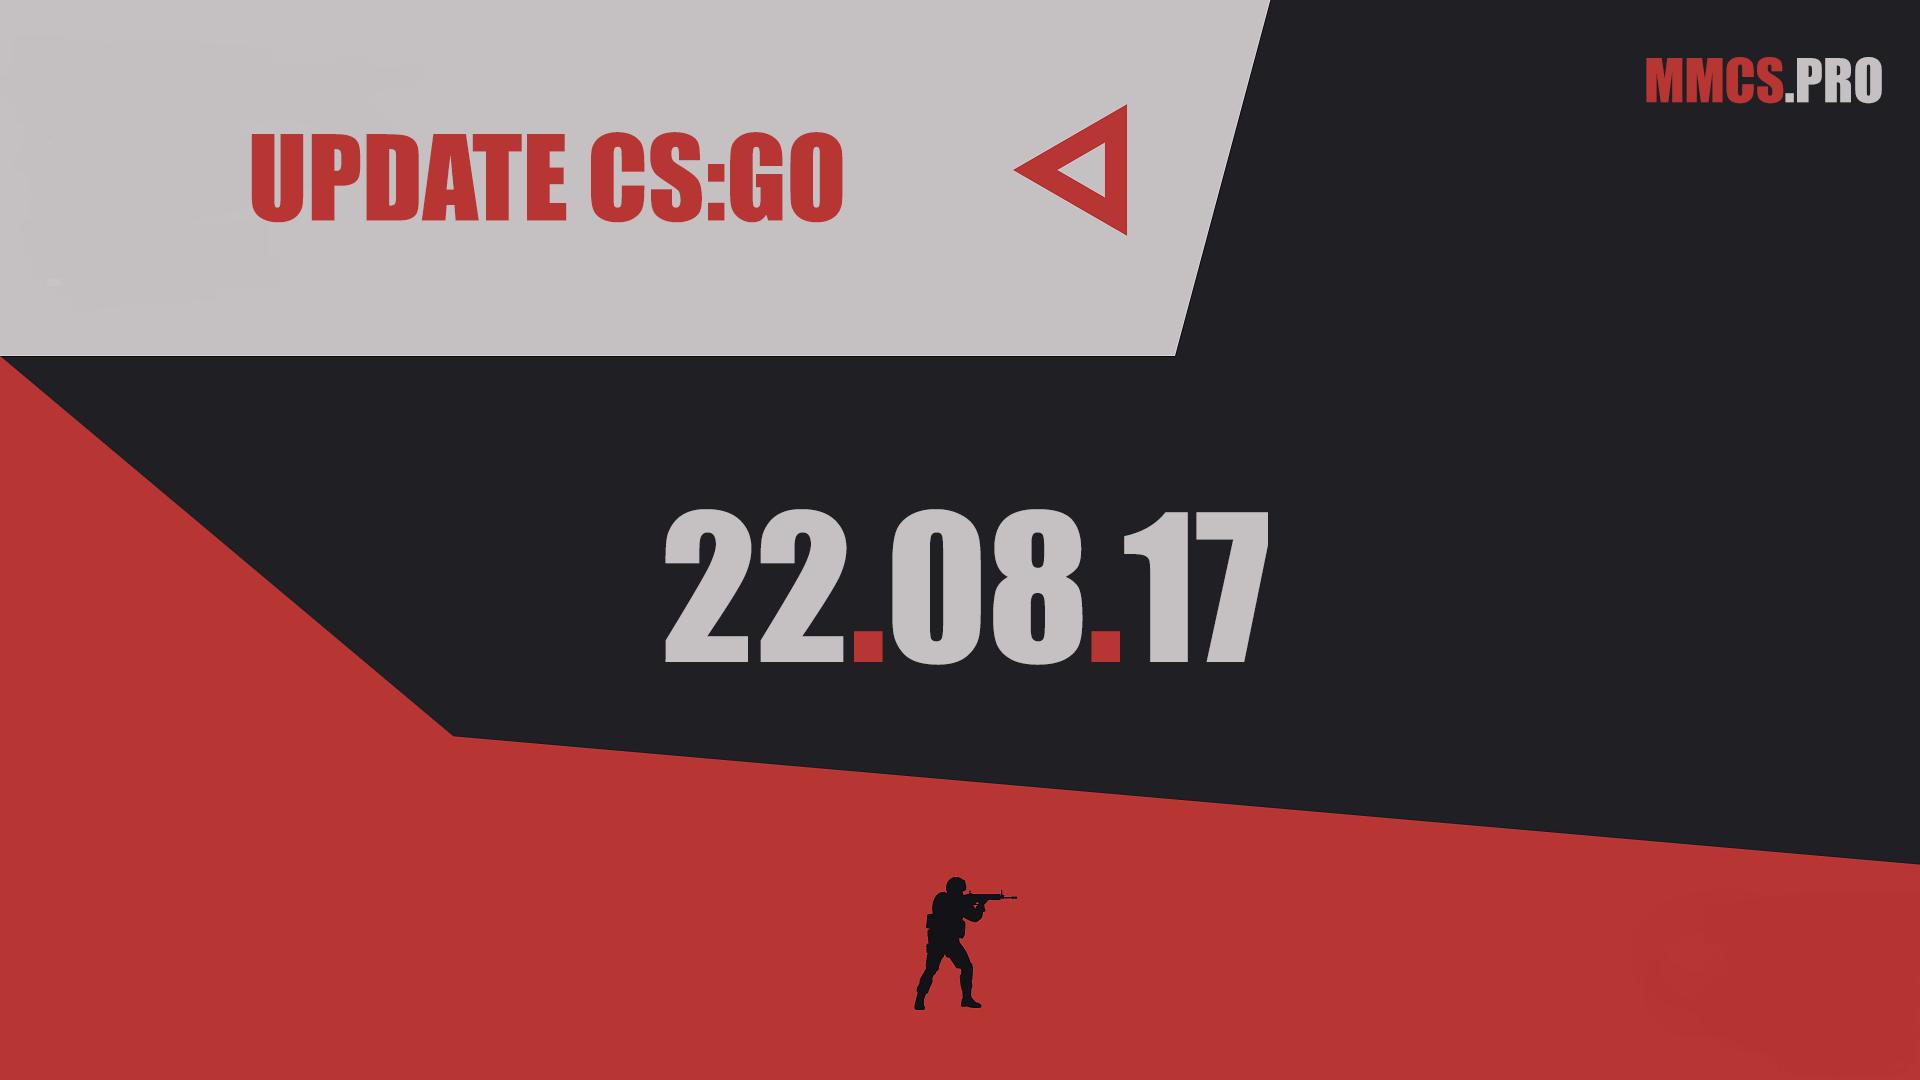 https://mmcs.pro/update-csgo-22-08-2017-valve/